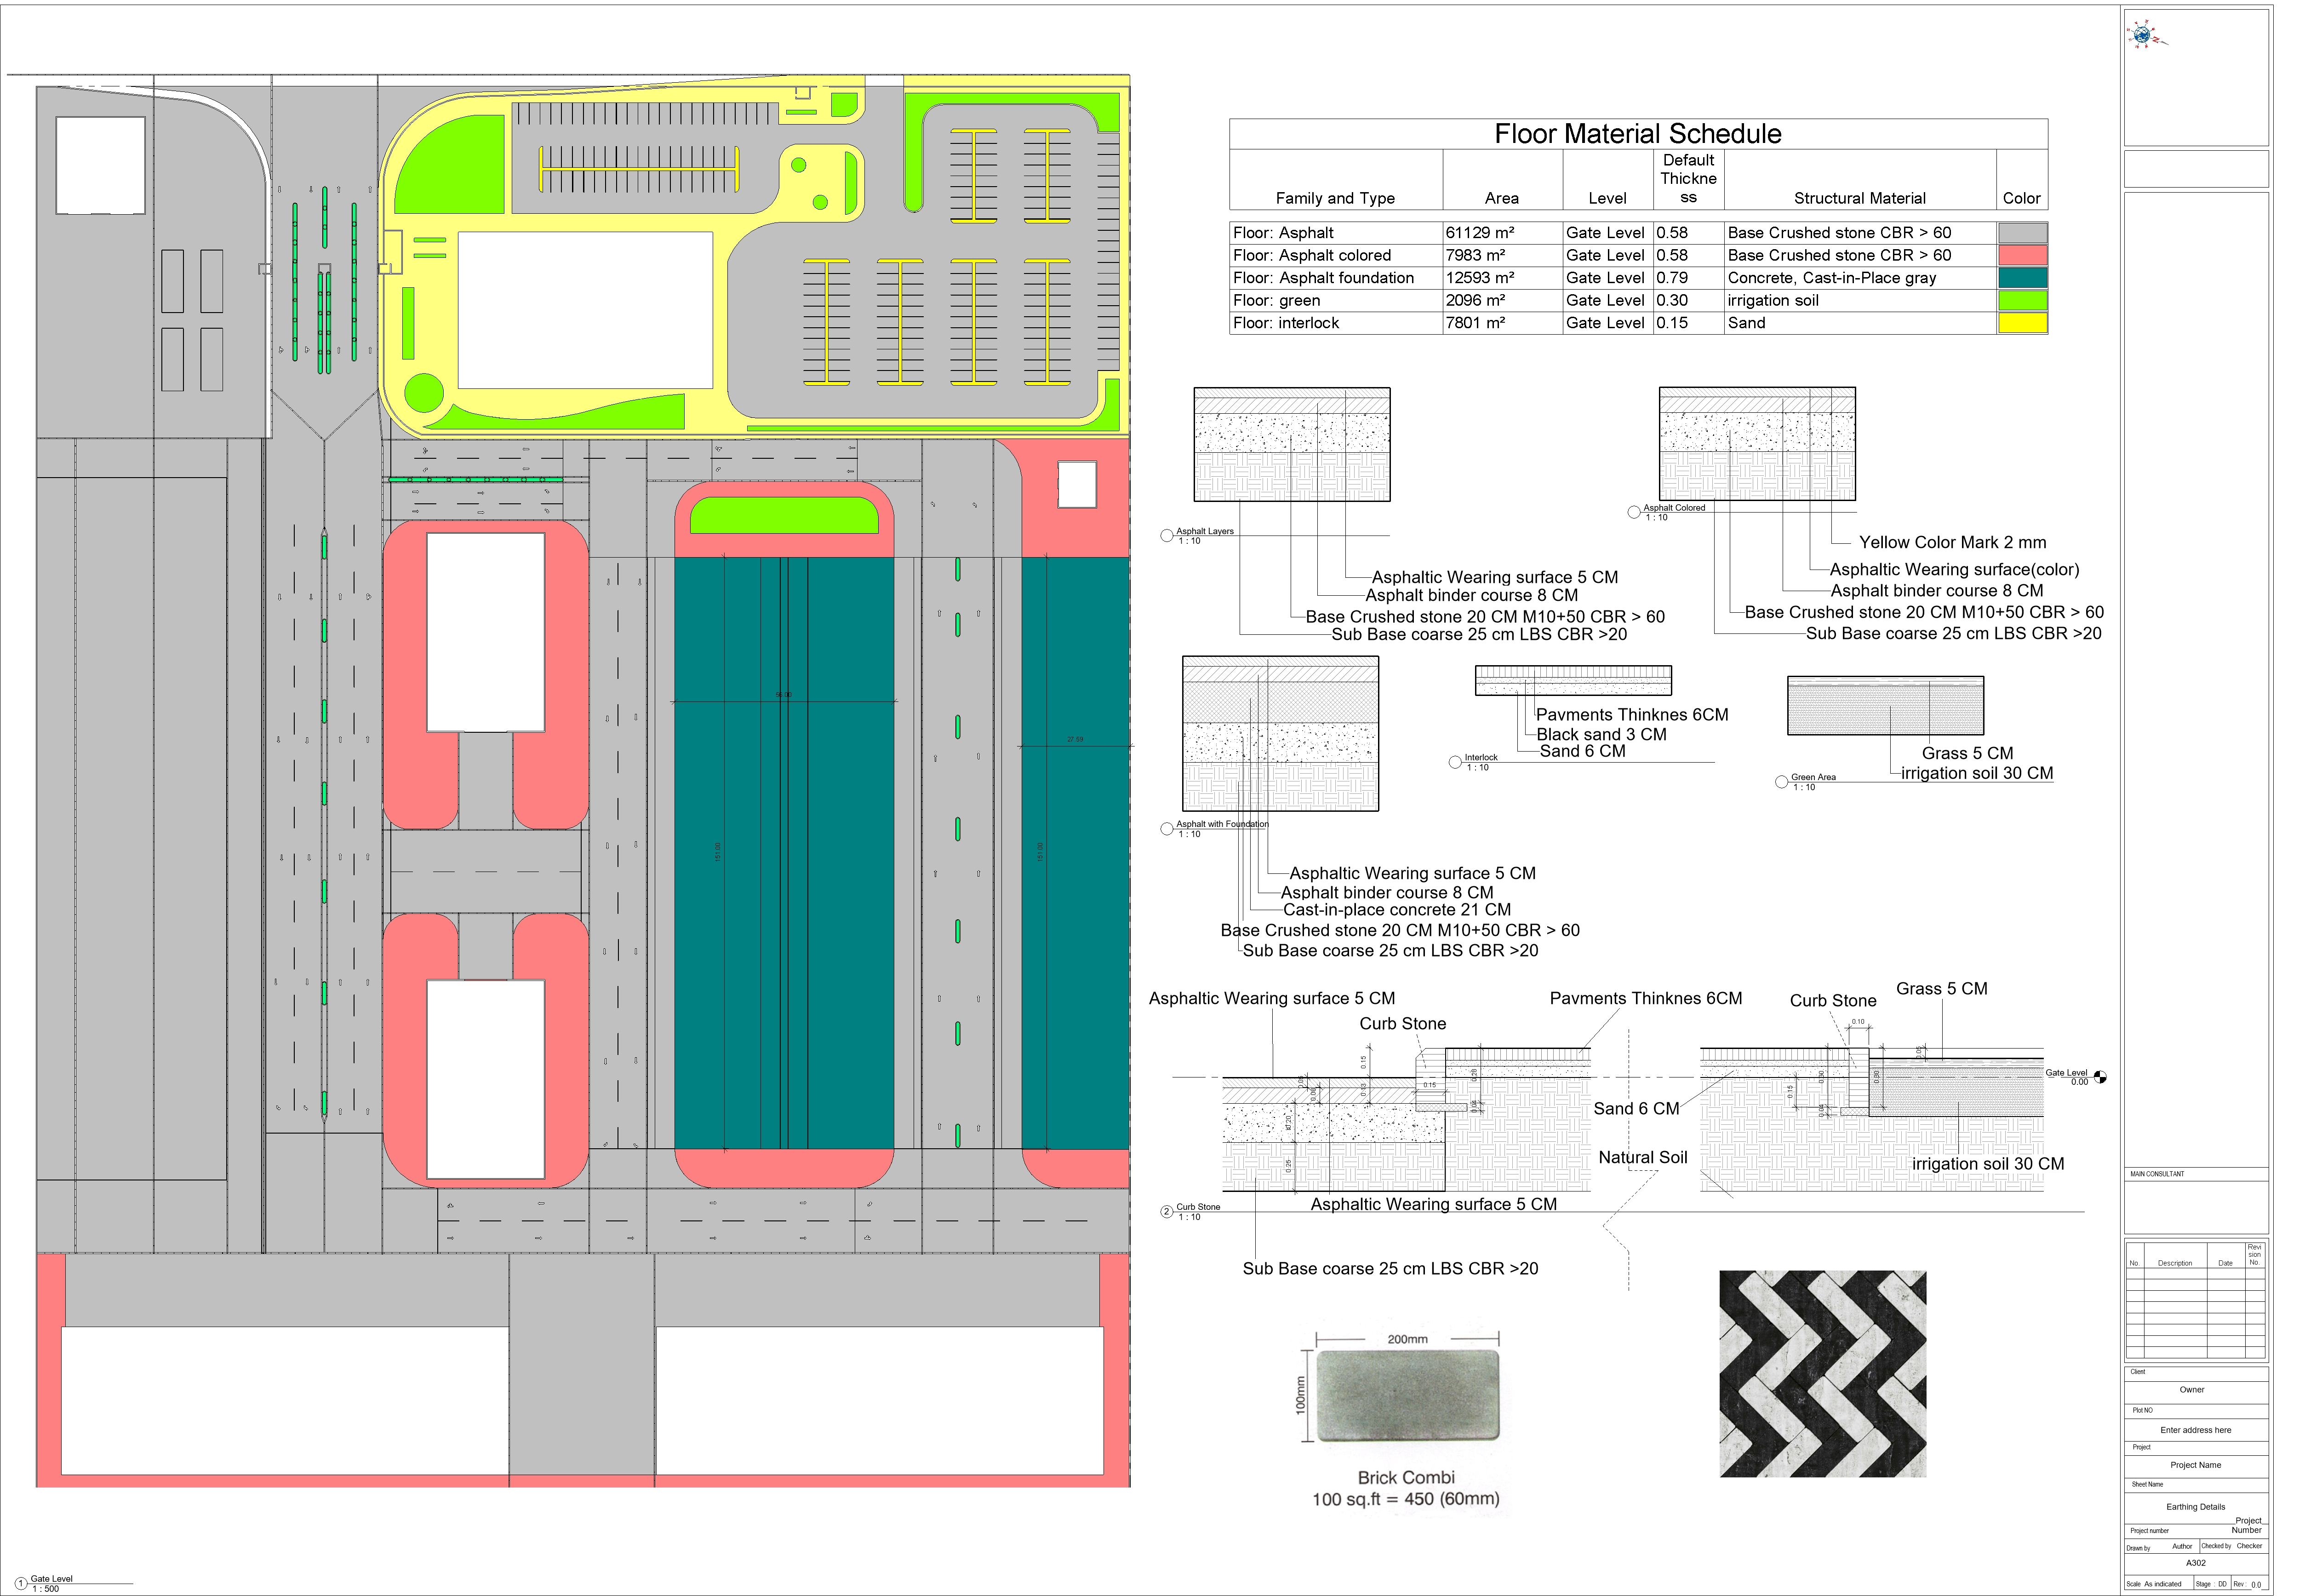 kazakhestan - Sheet - A302 - Earthing Details